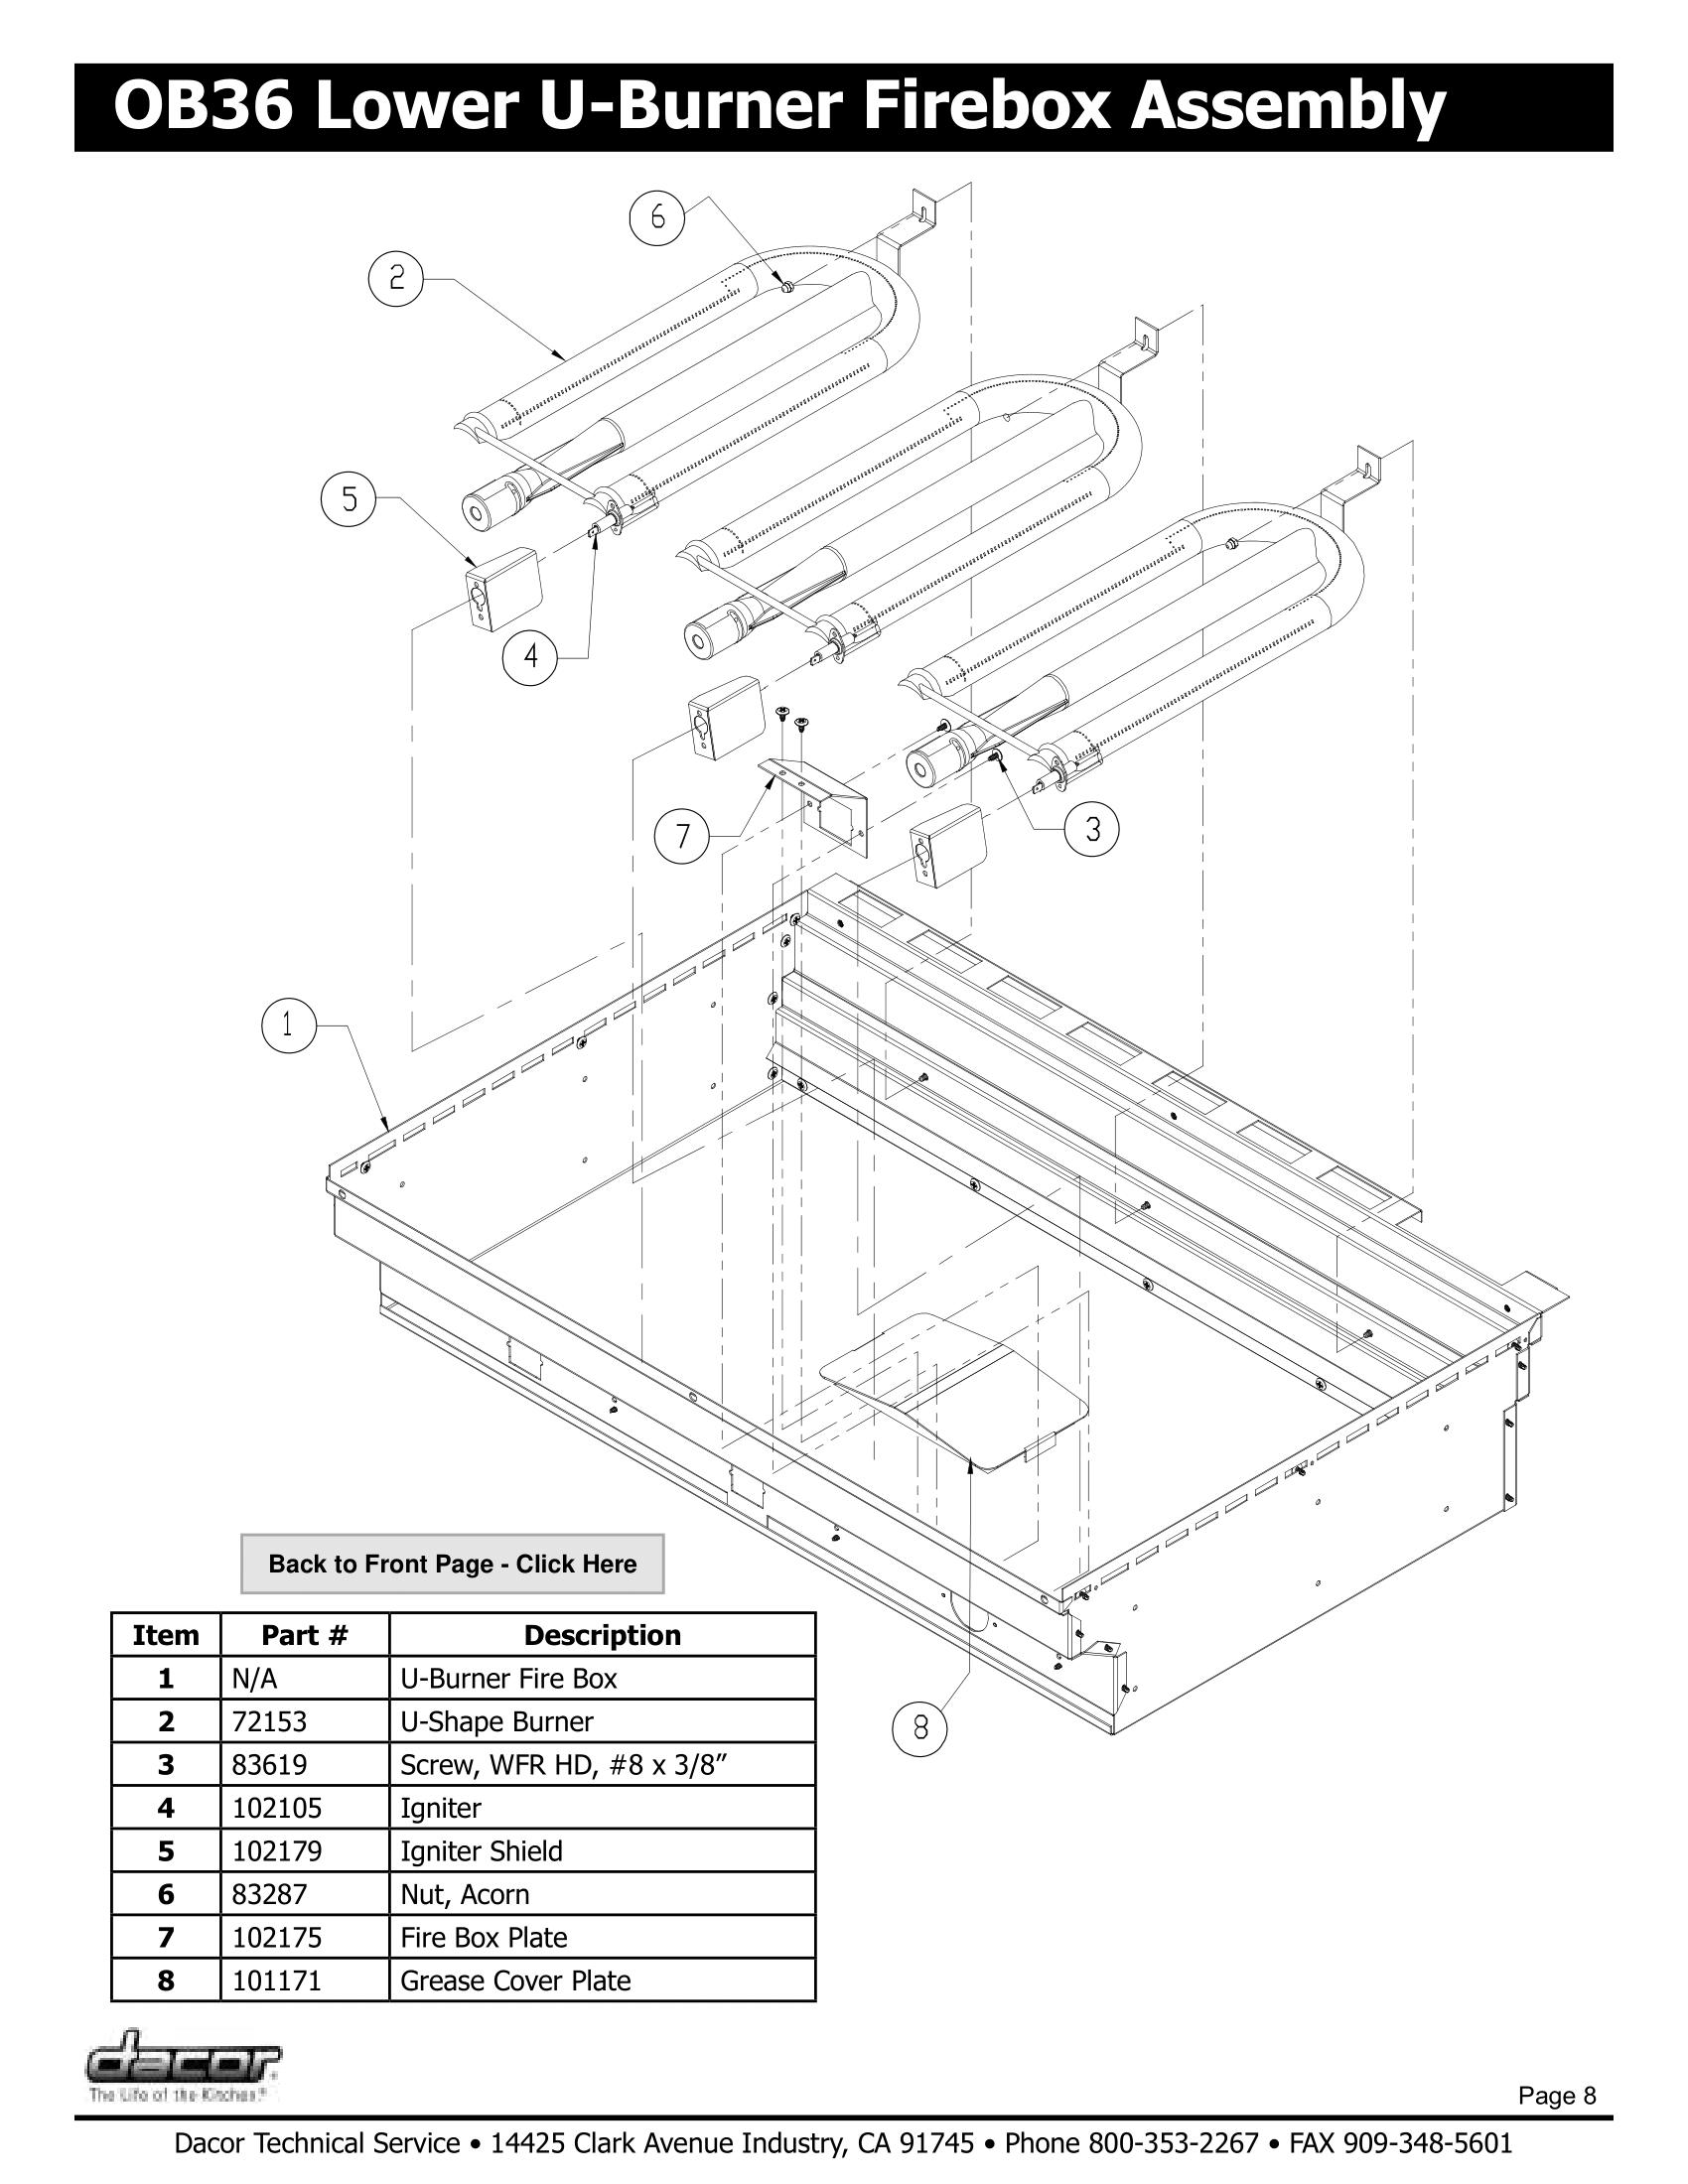 Dacor OB36 Lower U-Burner Firebox Assembly Schematic